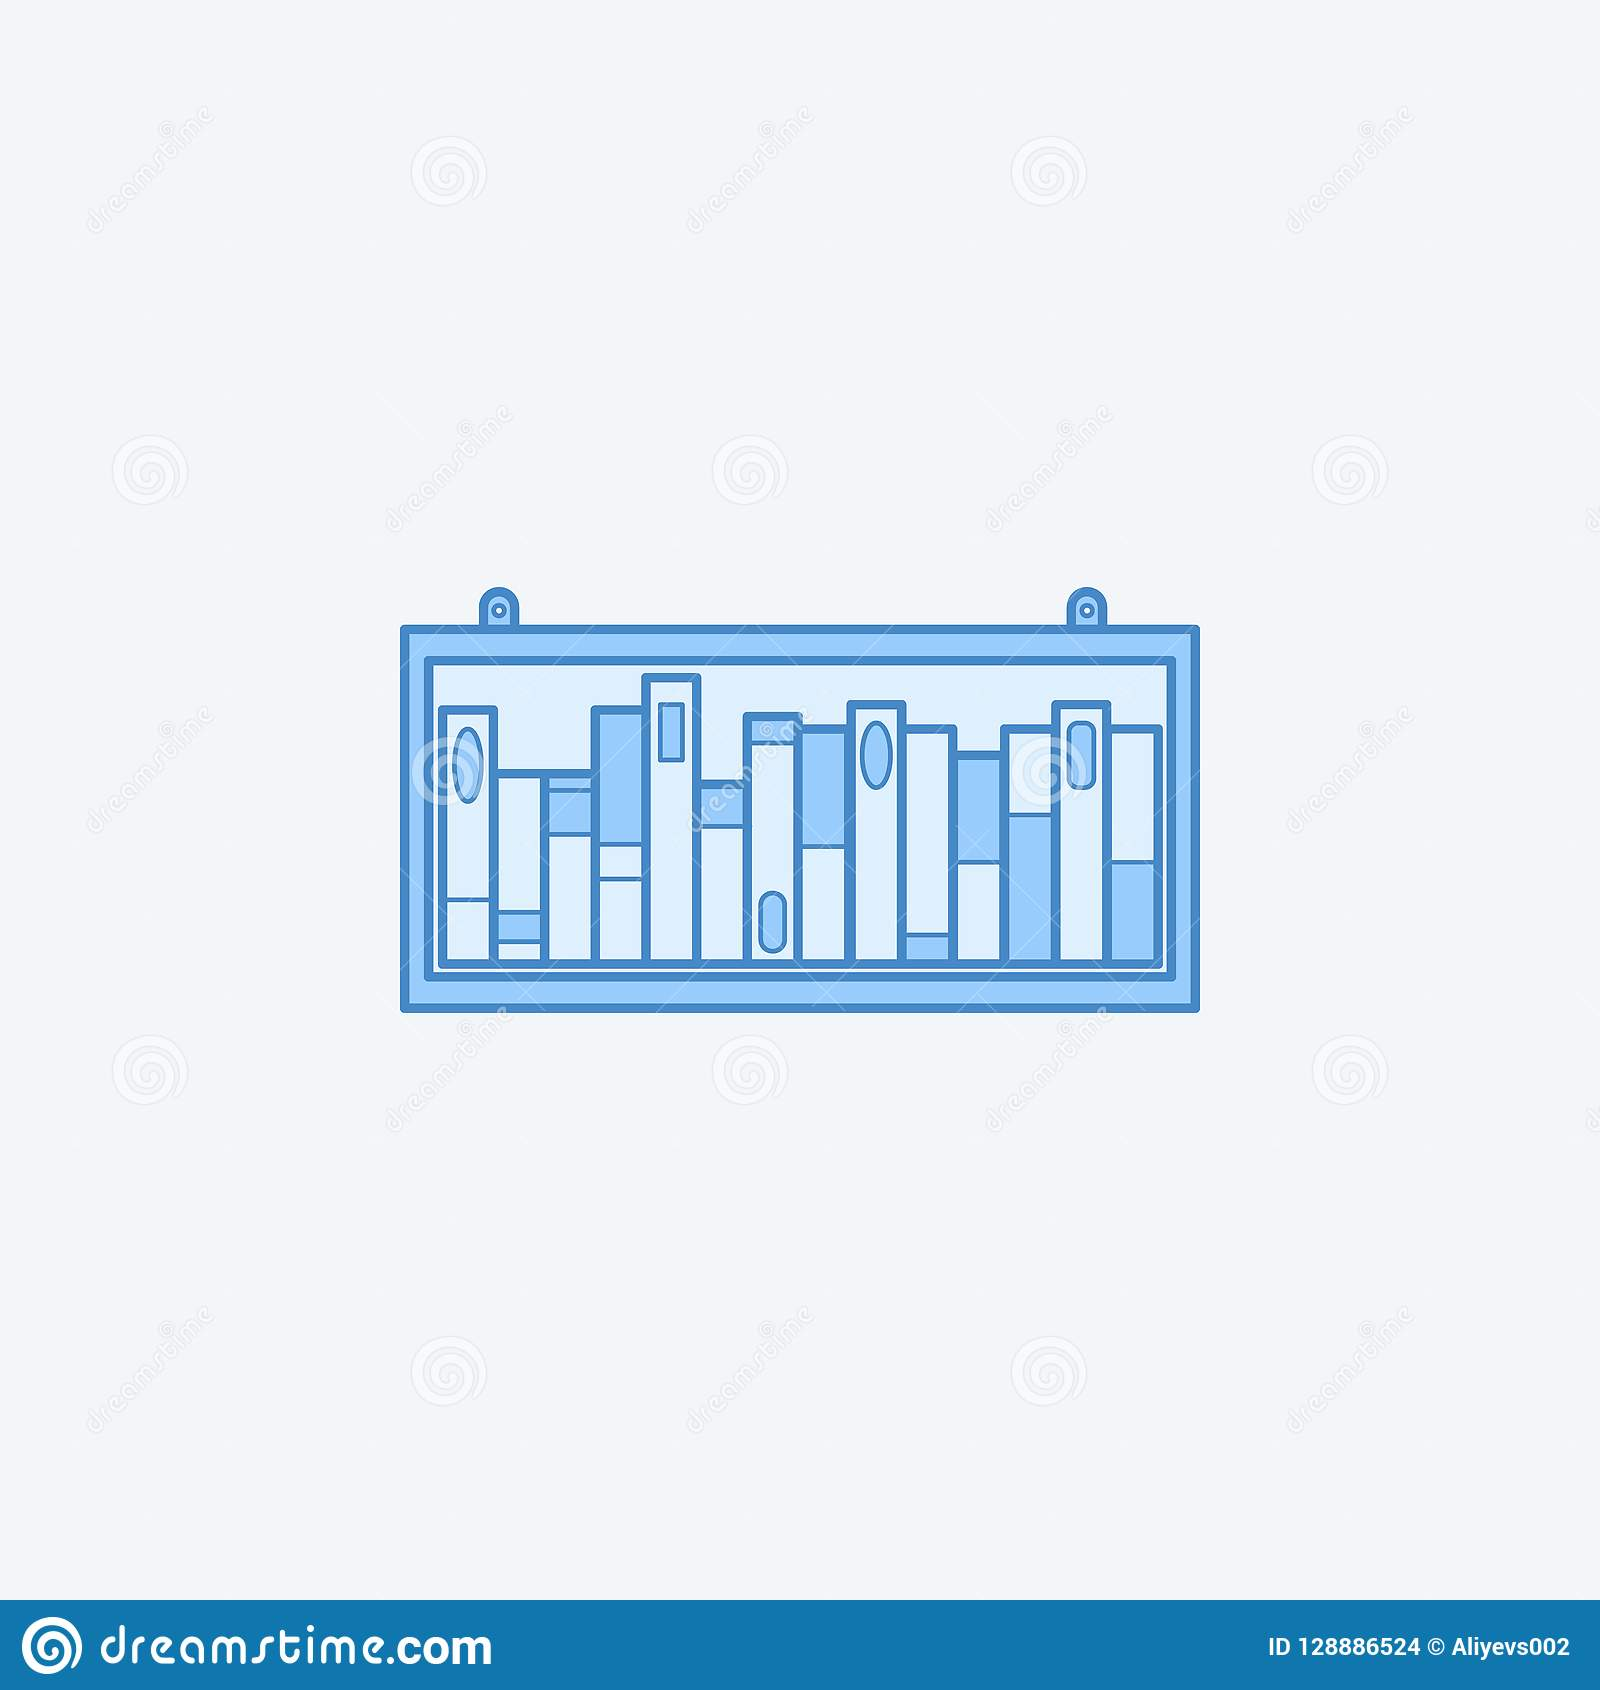 Bookshelf 2 Colored Line Icon Simple Dark And Light Blue Element Illustration Concept